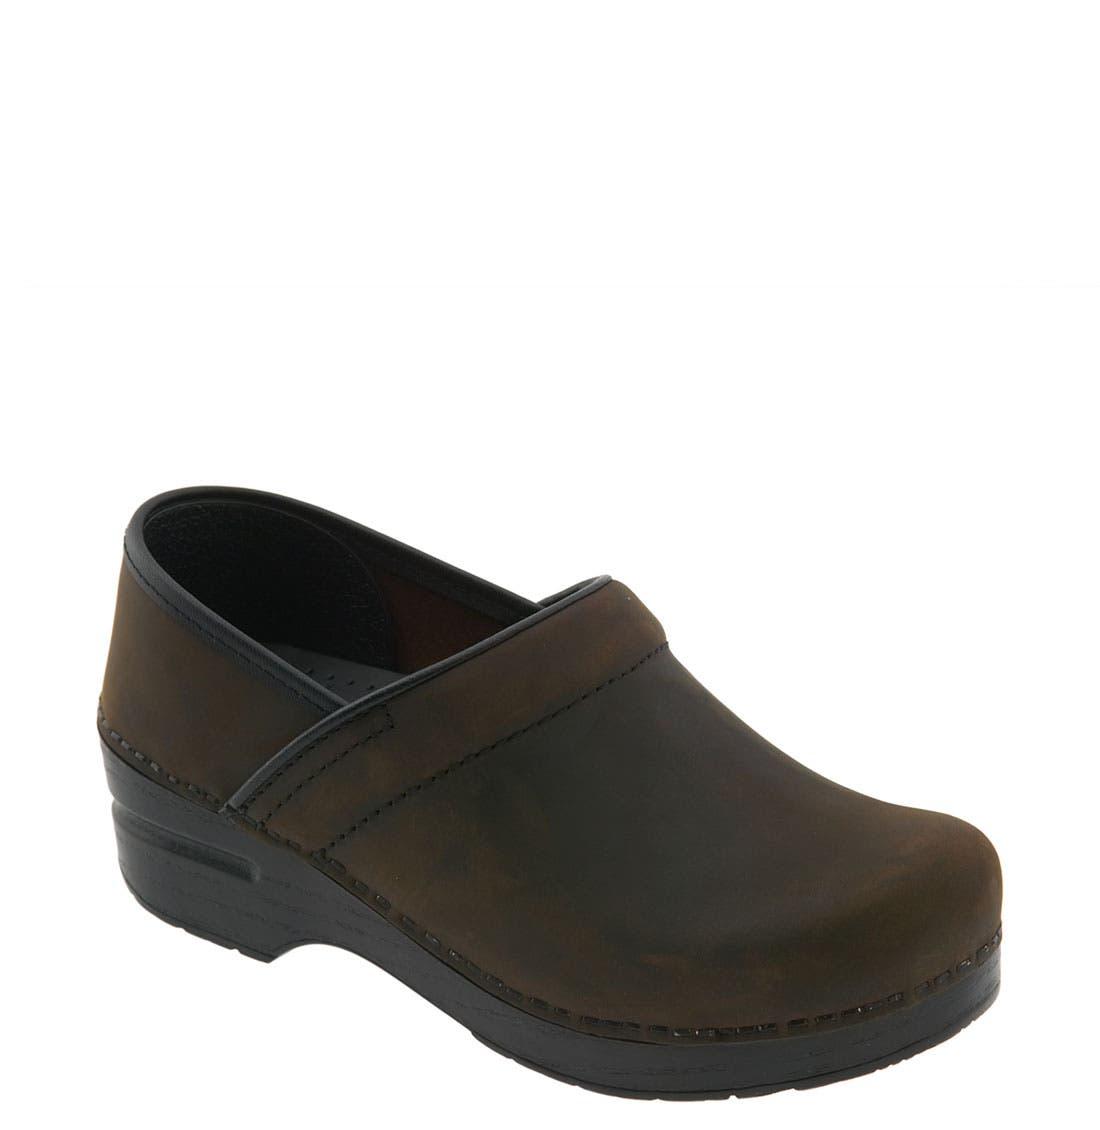 DANSKO 'Professional - Narrow' Oiled Leather Clog